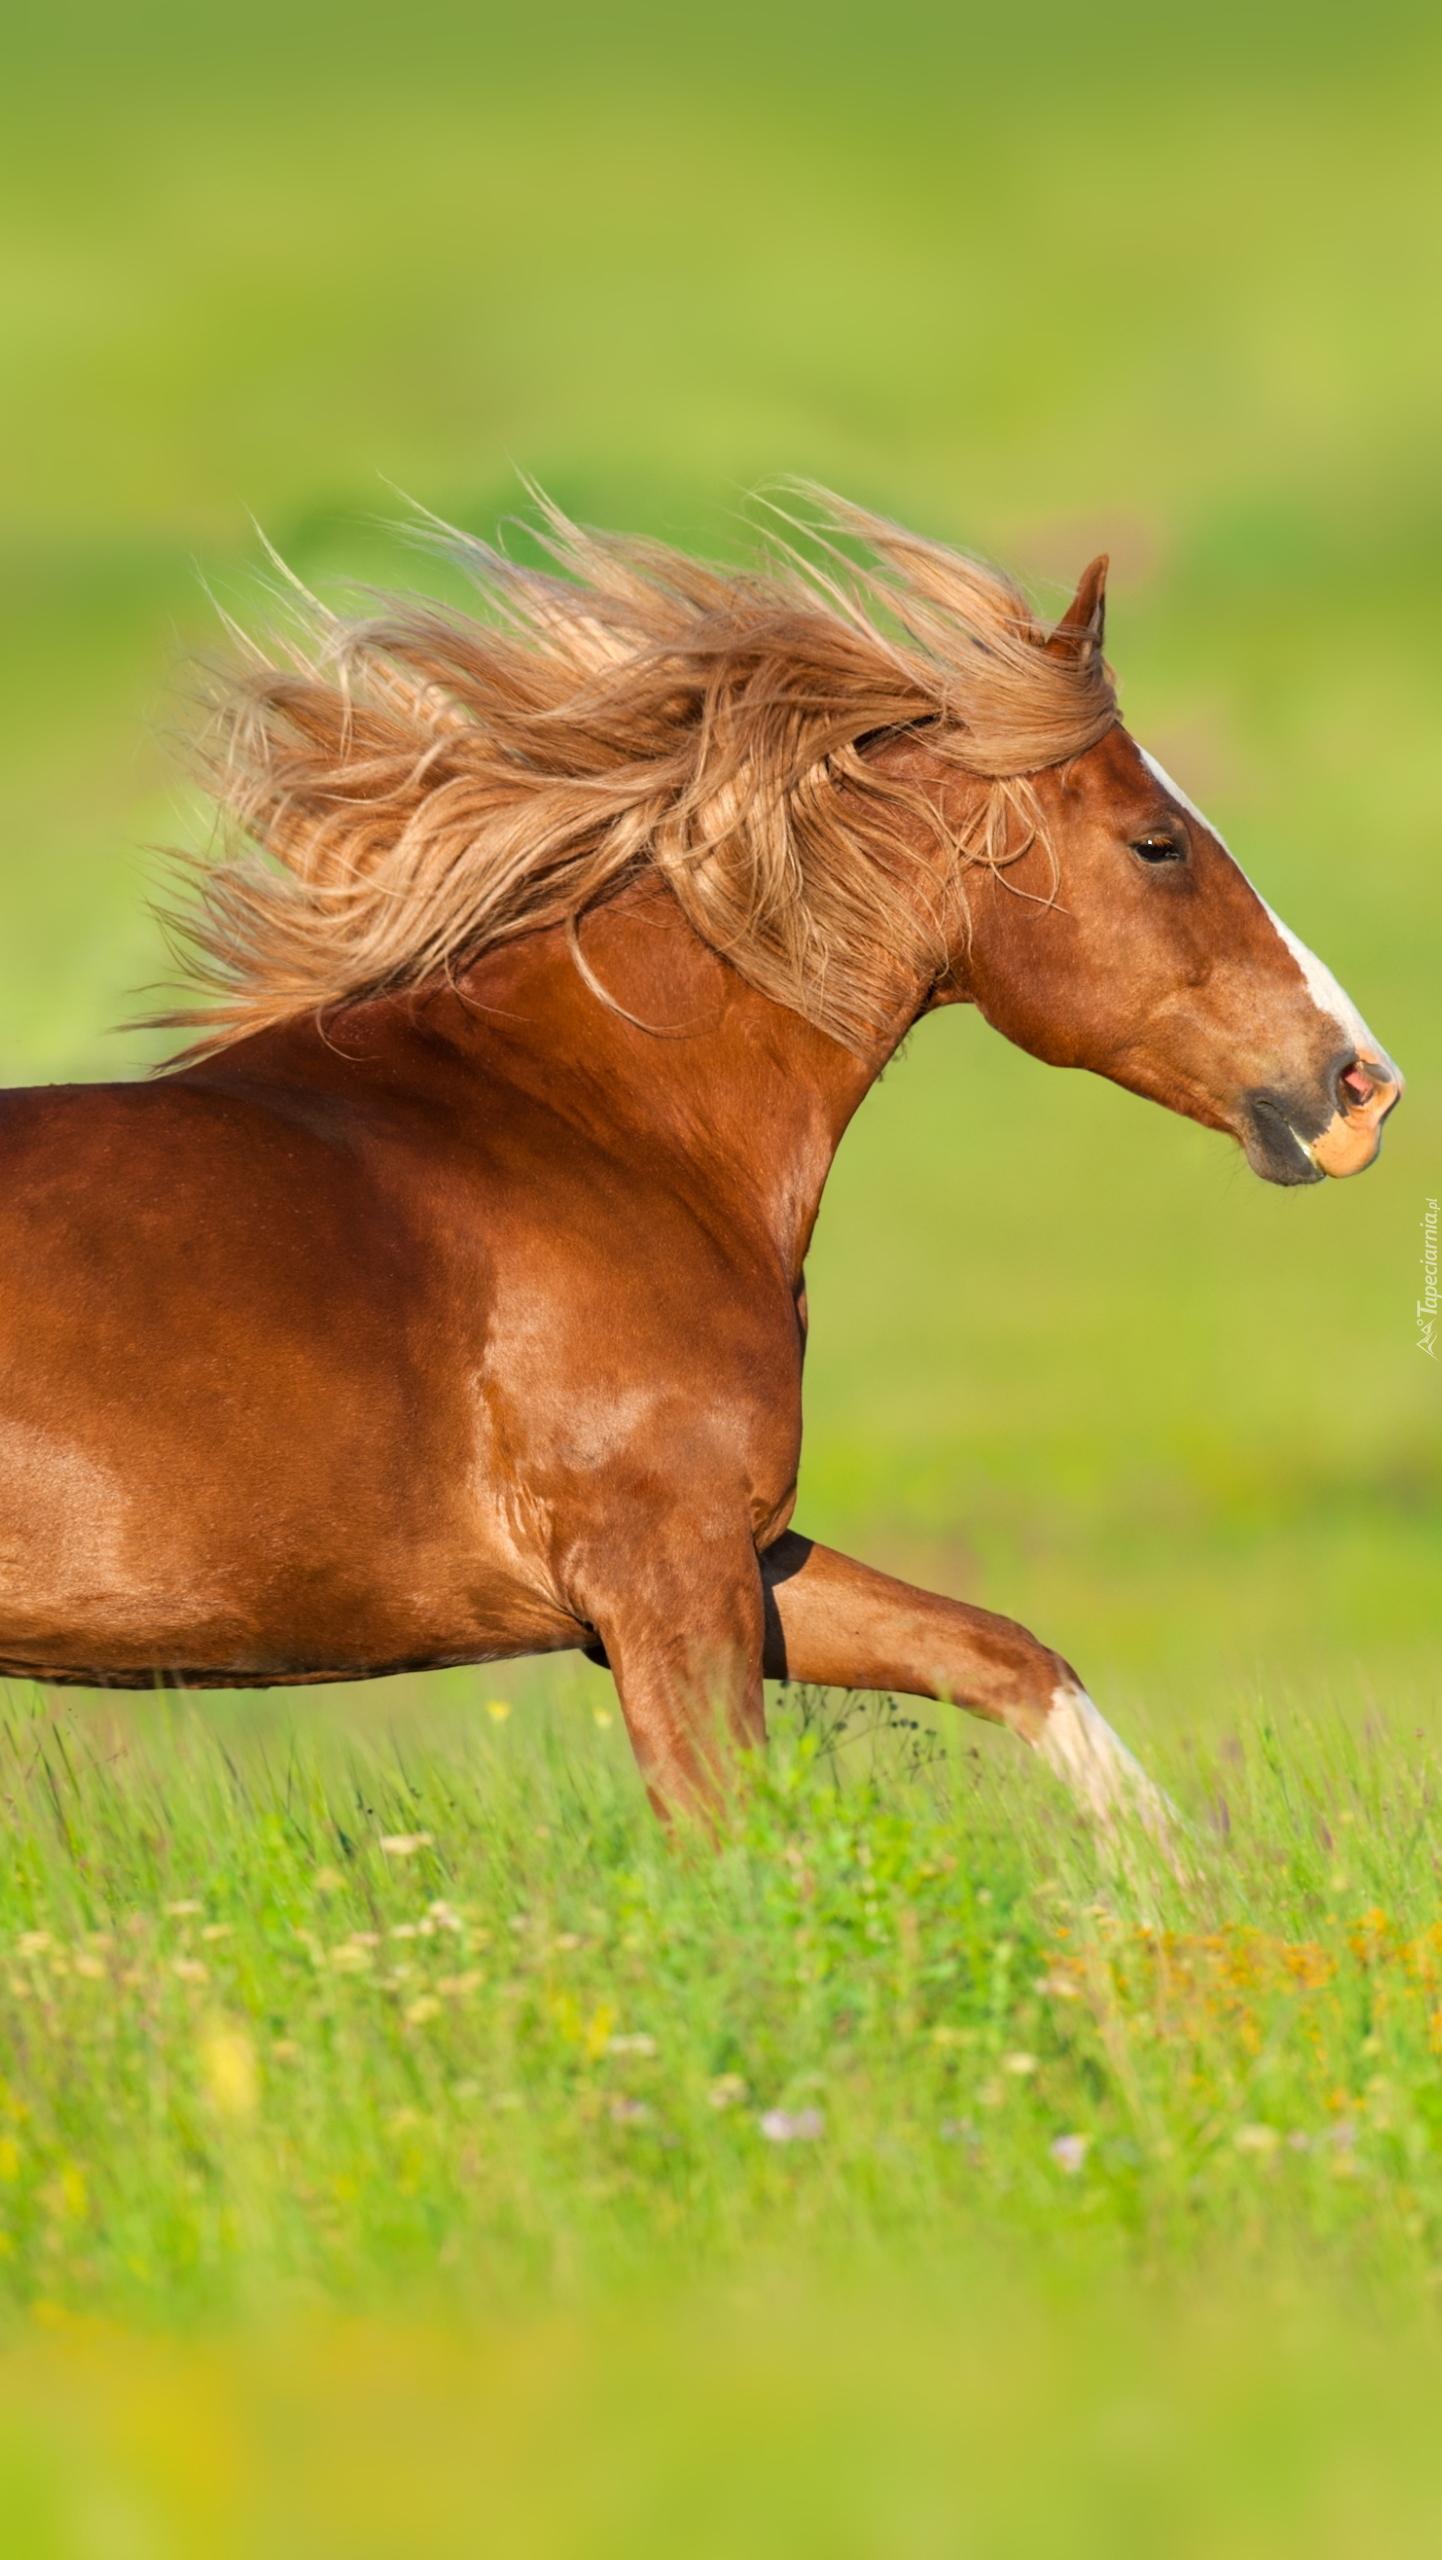 Kasztanowaty koń